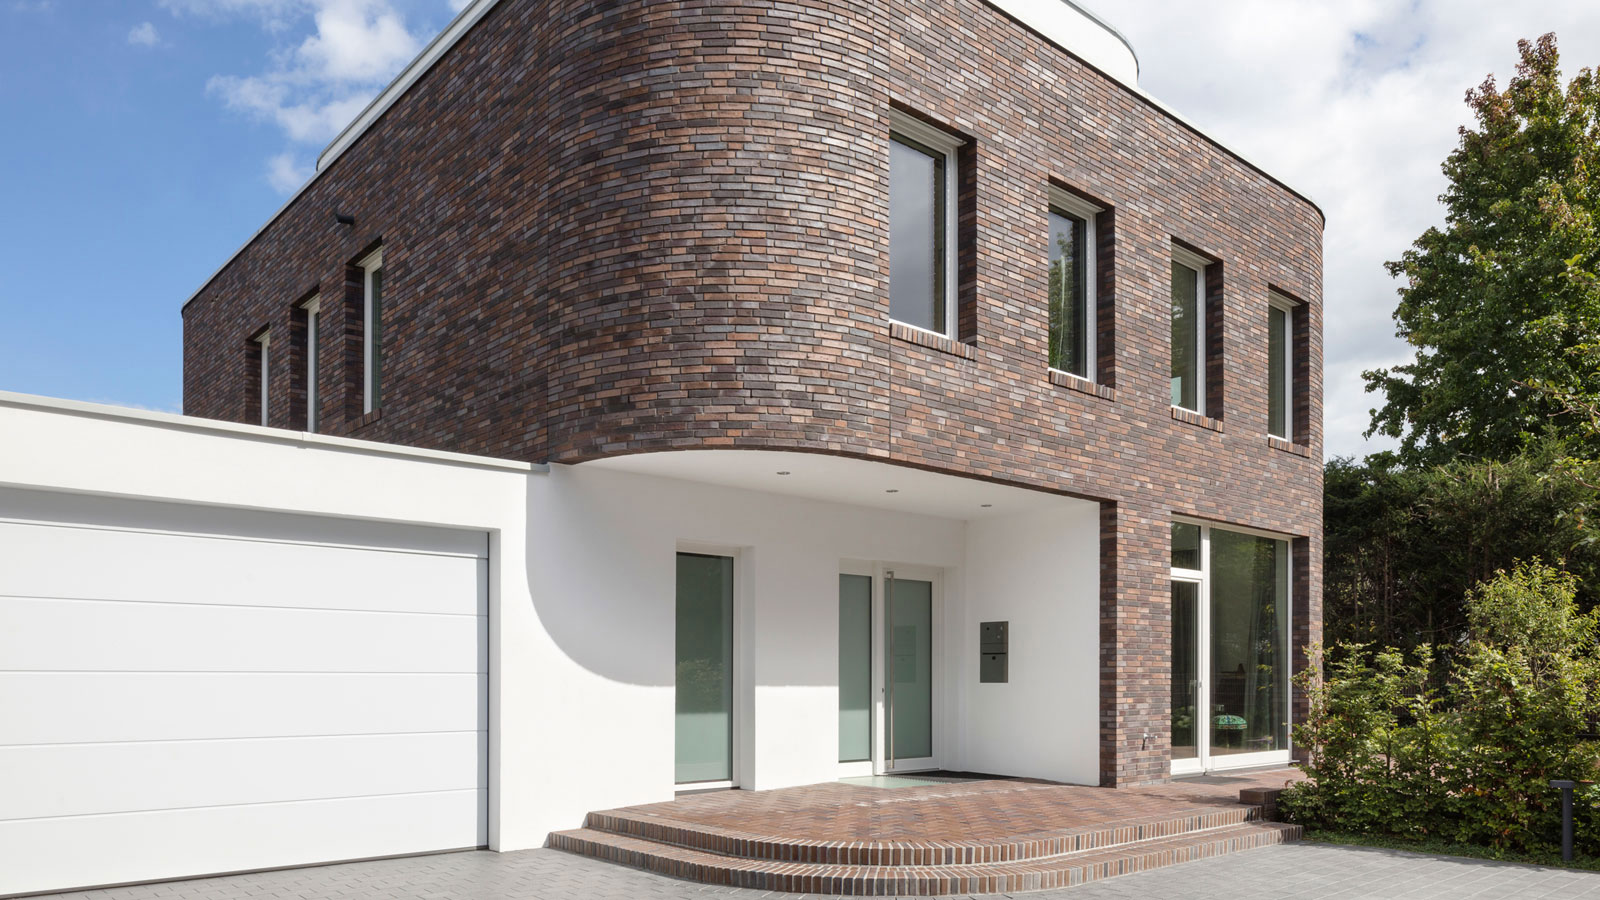 Architekt Bonn start architekt bonn koenigs rütter architekten